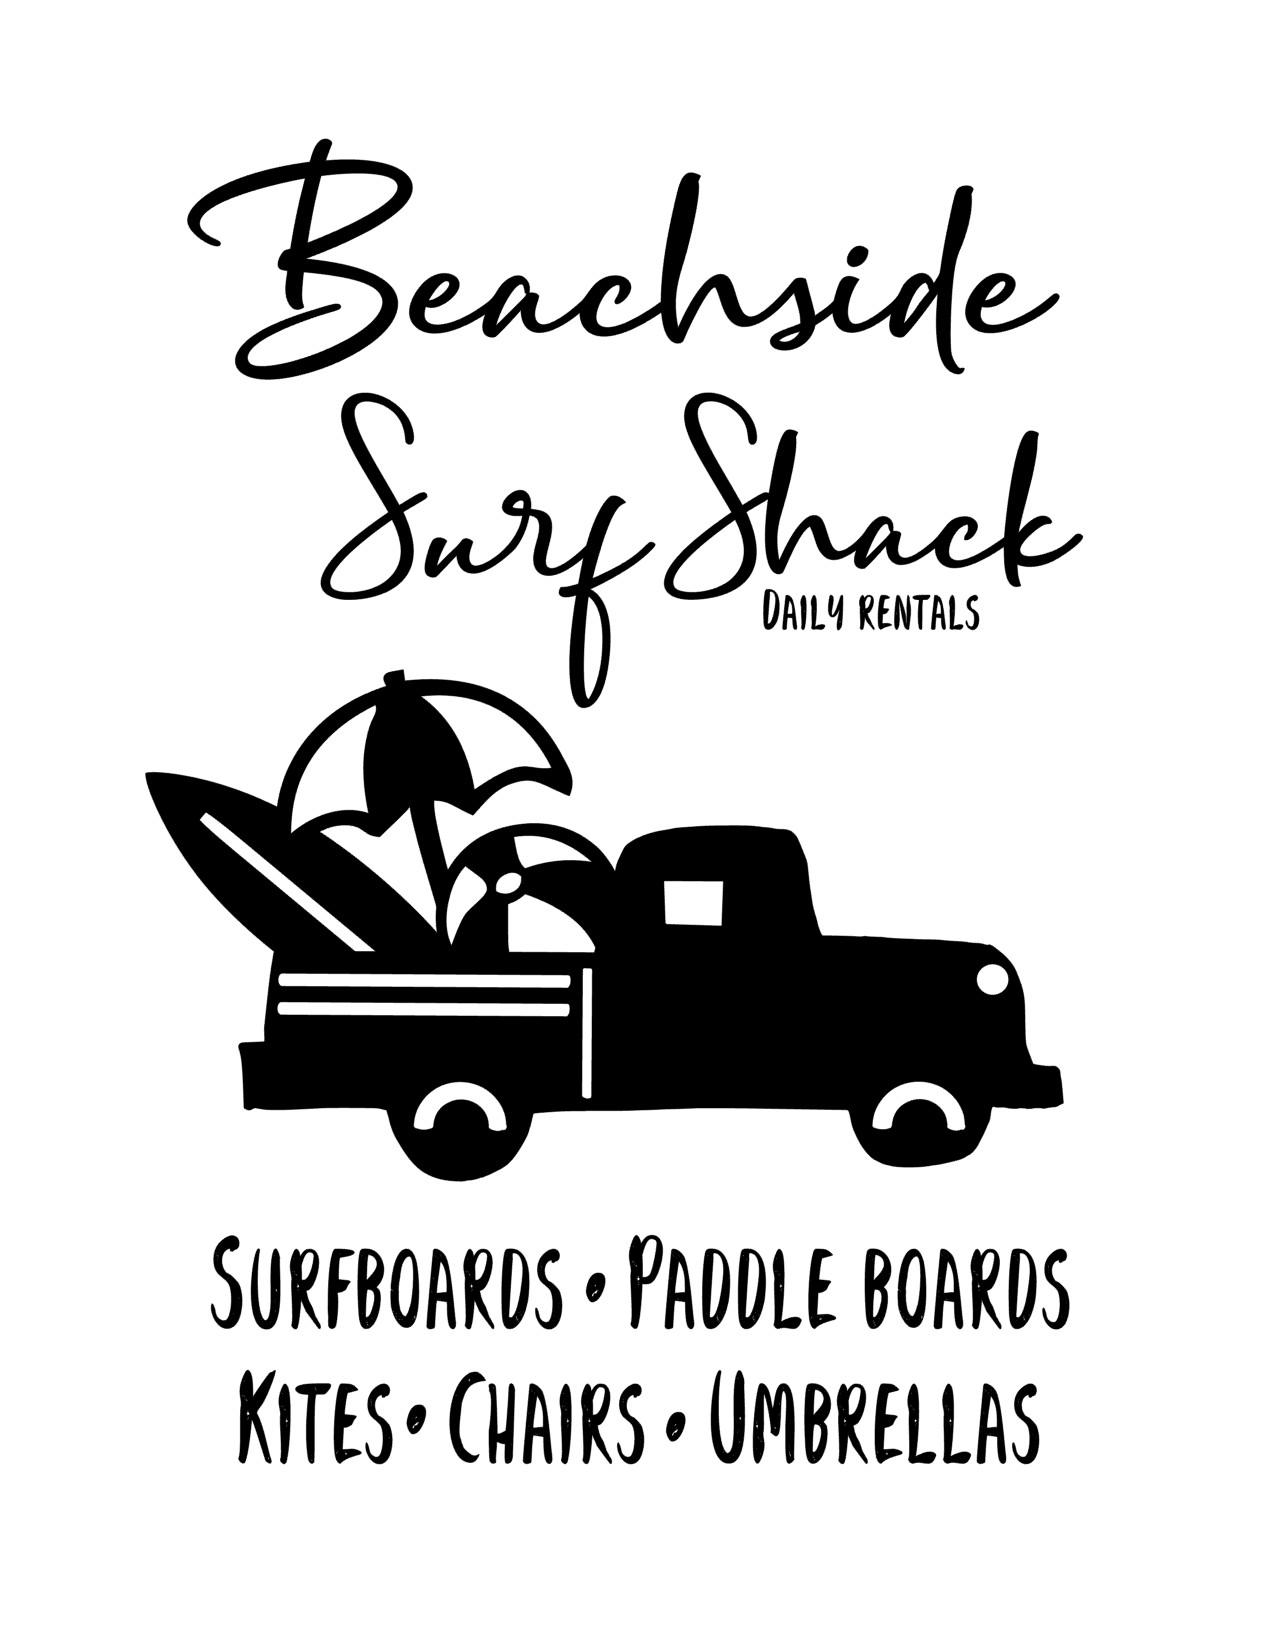 Anchored Soul Surf Shack Black Truck